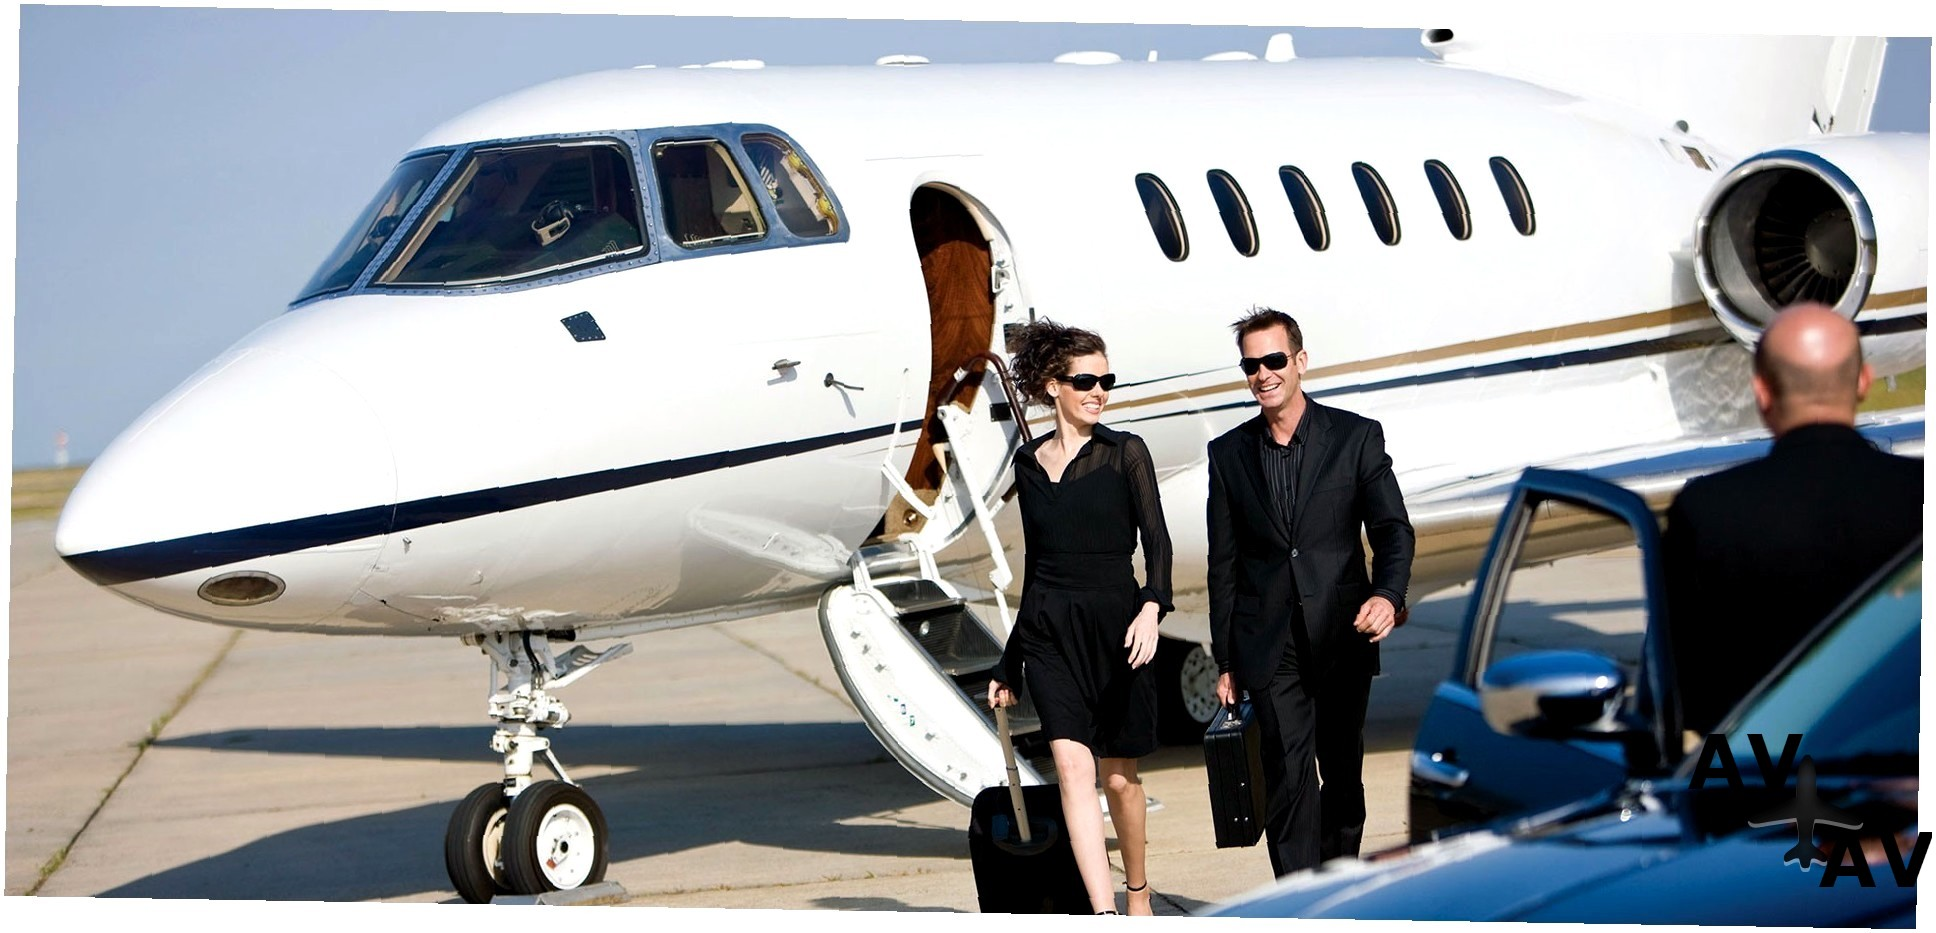 {:ru}Аэропорт Сангстера (Sangster International) коды IATA: MBJ ICAO: MKJS город: Монтего Бей (Montego Bay) страна: Ямайка (Jamaica){:}{:ua}Аеропорт Сангстер (Sangster International) коди IATA: MBJ ICAO: MKJS місто: Монтего Бей (Montego Bay) країна: Ямайка (Jamaica){:}